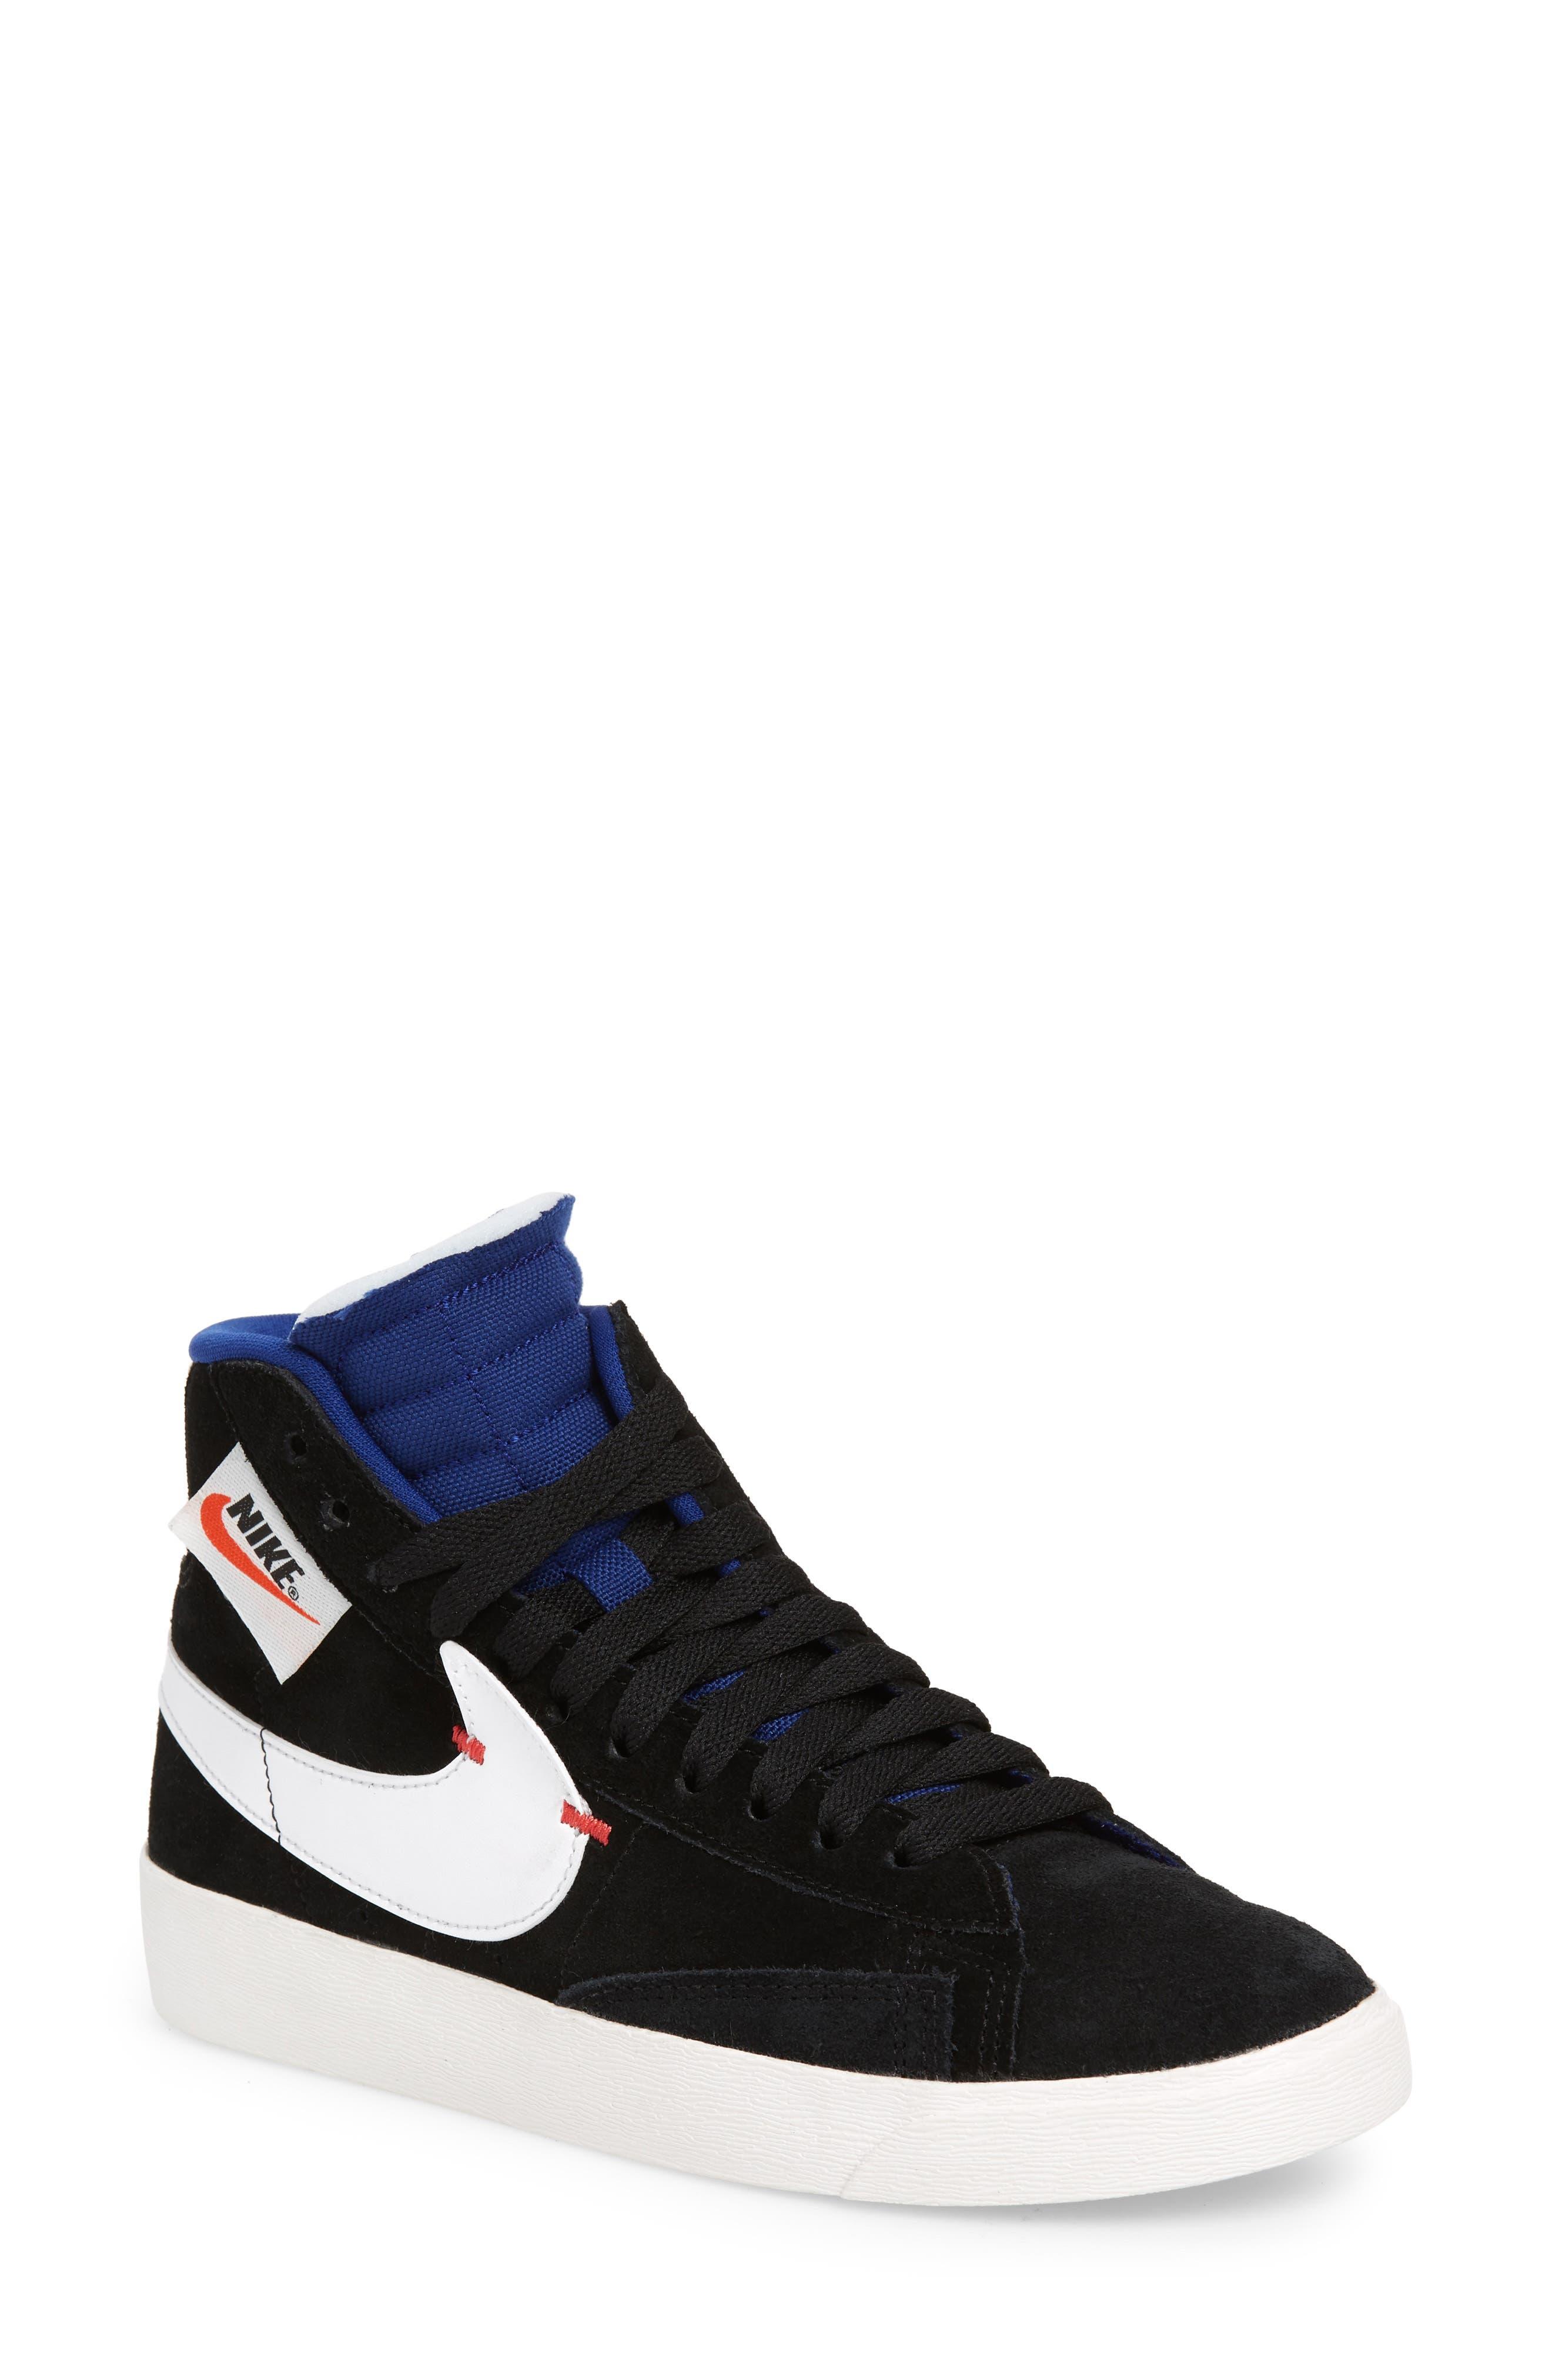 super popular 21f6f db6a3 ... cheapest nike blazer mid rebel sneaker main color black white deep  royal 15f73 33fce